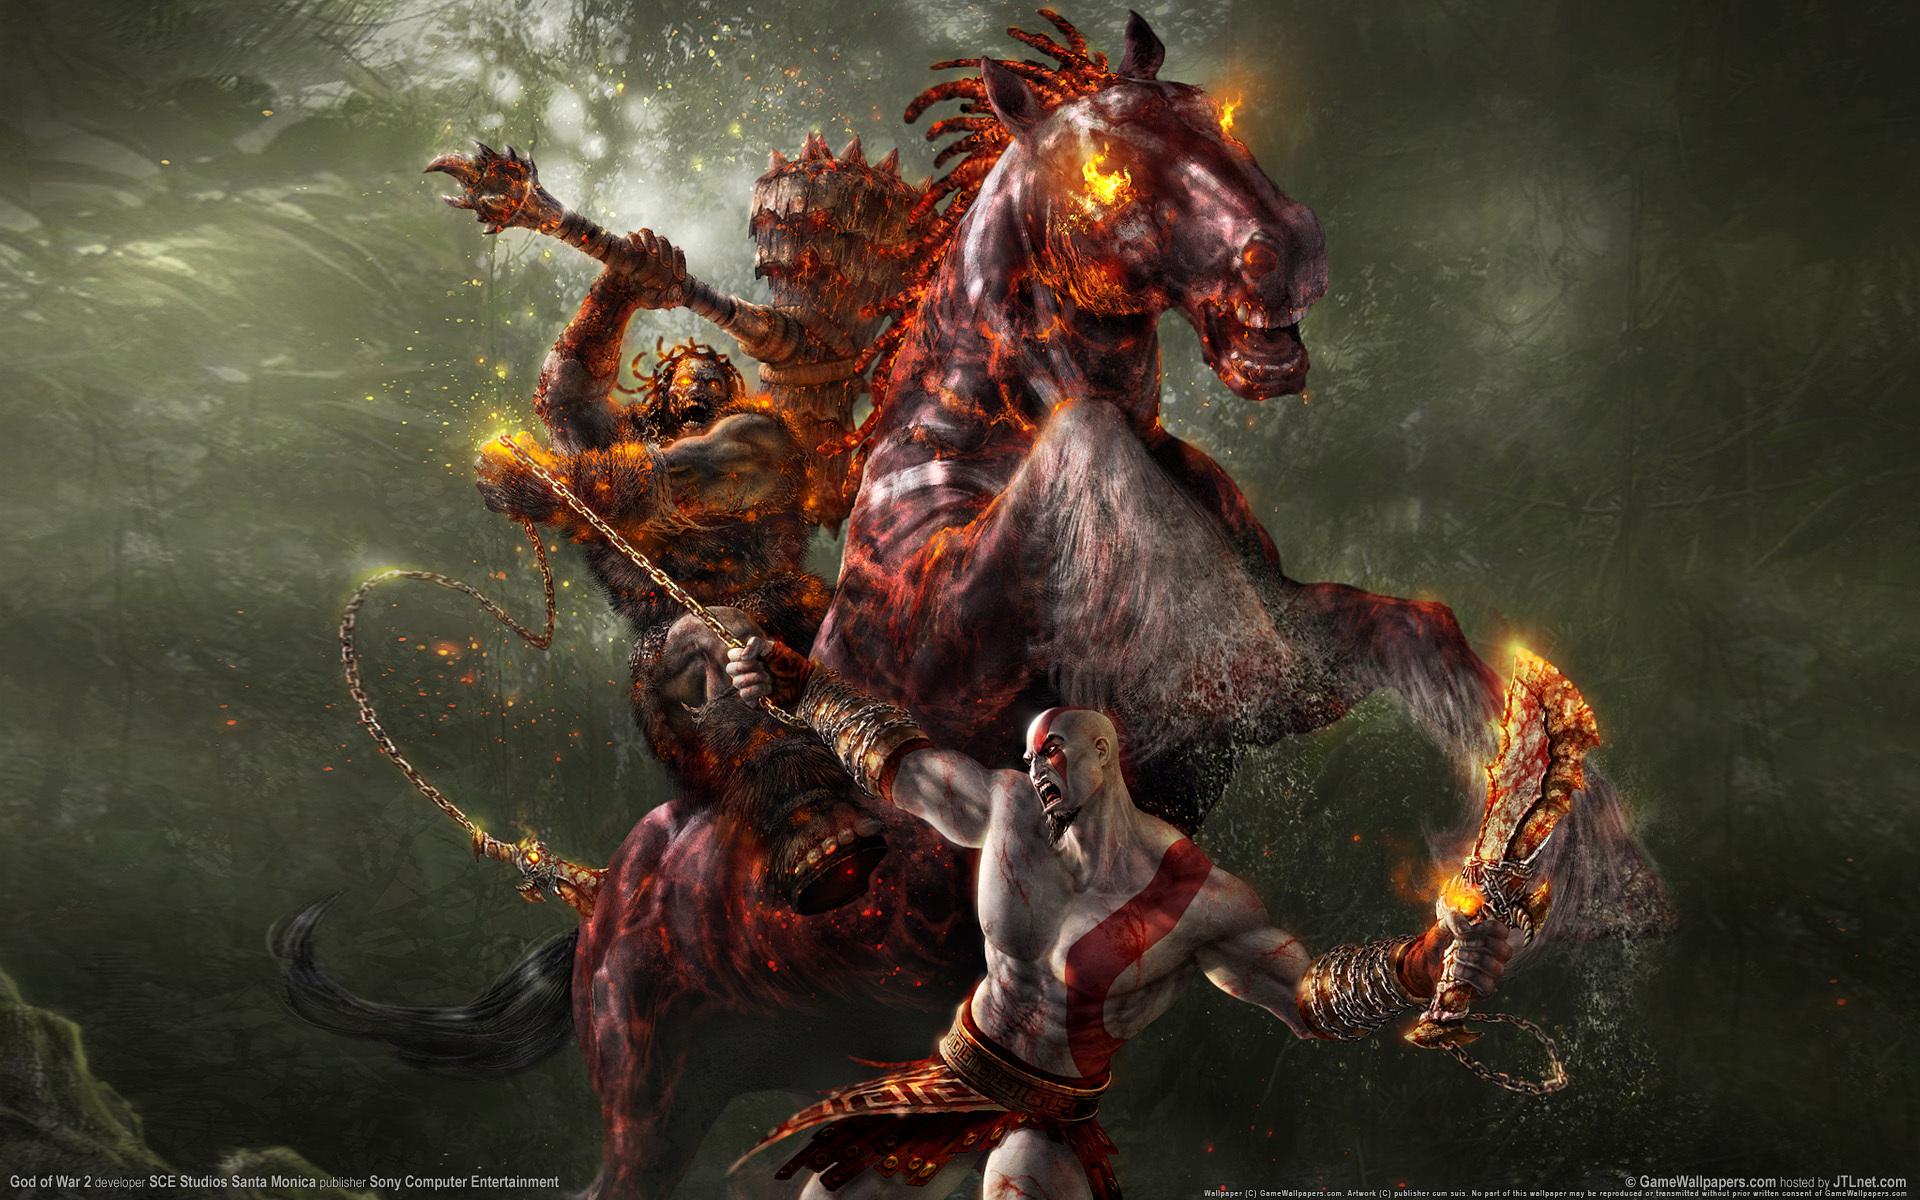 Гнев титанов, монст, Химера  № 1524115 бесплатно